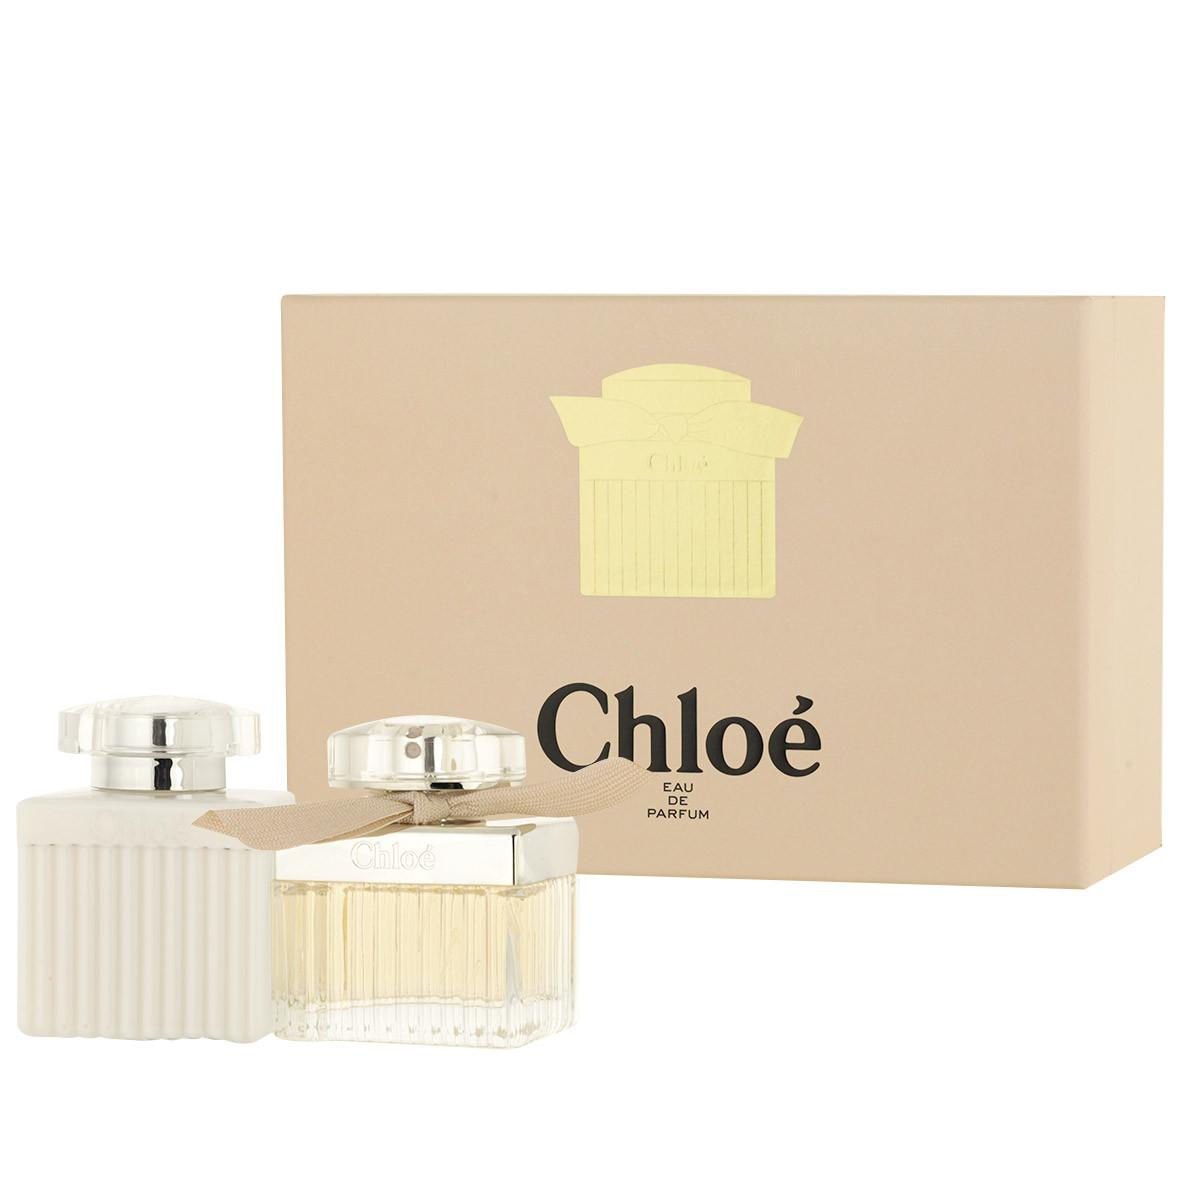 chloe chlo eau de parfum edp 50 ml bl 100 ml woman. Black Bedroom Furniture Sets. Home Design Ideas